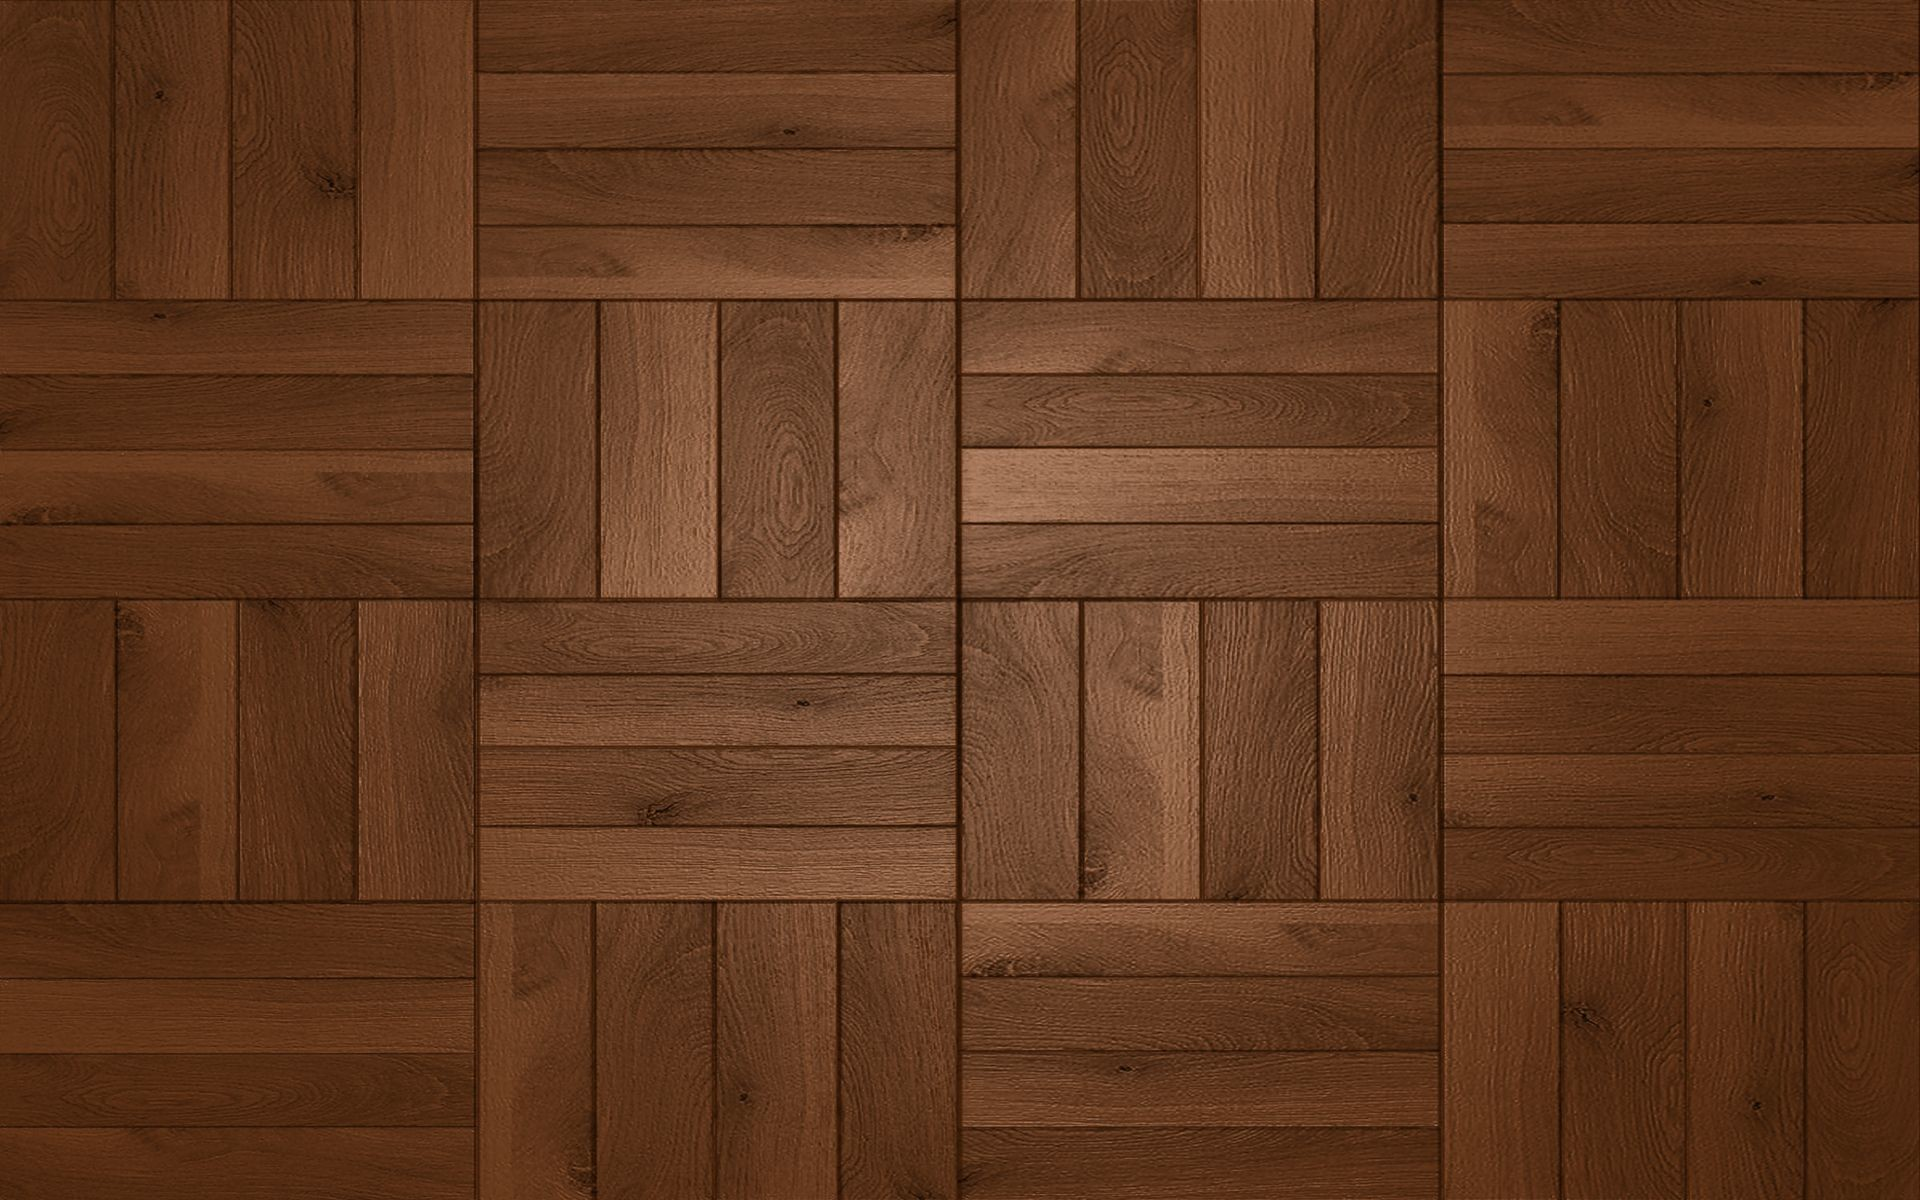 Res: 1920x1200, Wood HD Wallpaper 15 Download | Wallpicshd